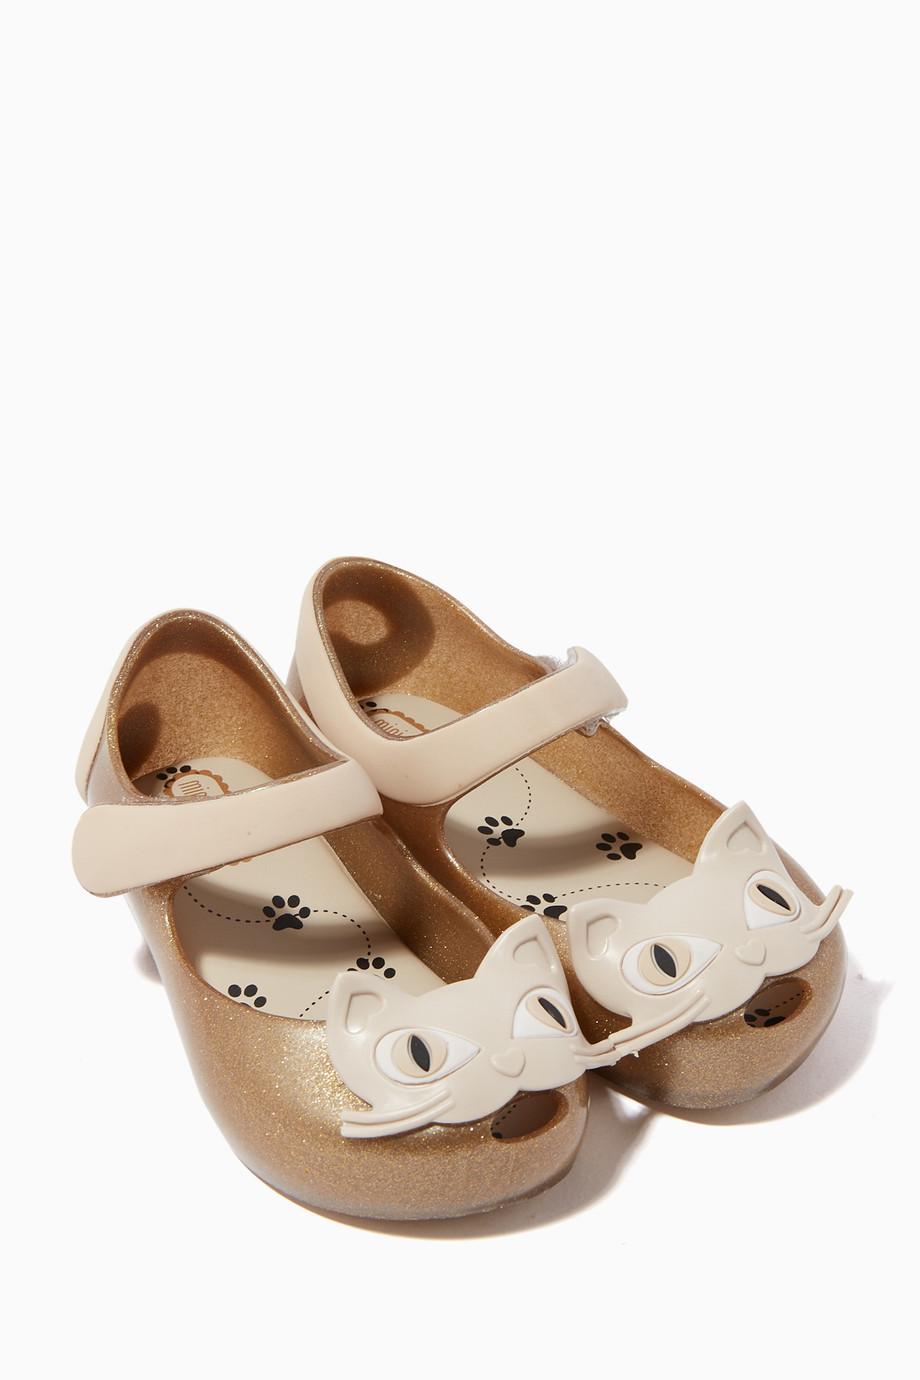 464e157f2 Shop Mini Melissa Neutral Kitten Applique Glitter Ballerina Flats ...